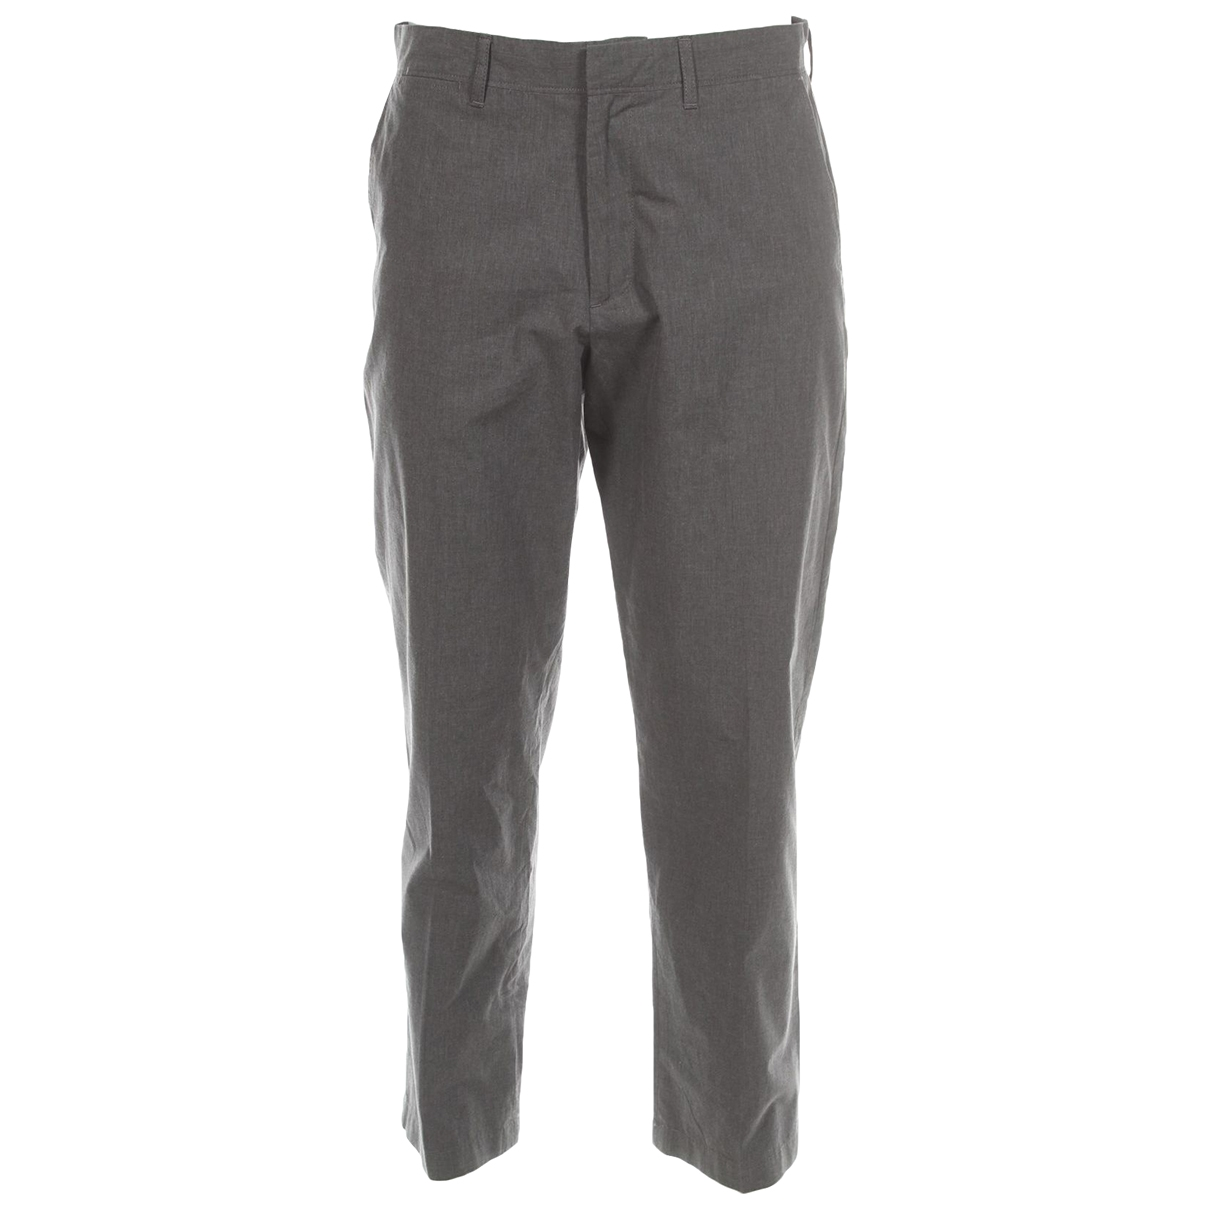 J.crew \N Grey Cotton Trousers for Men 32 UK - US